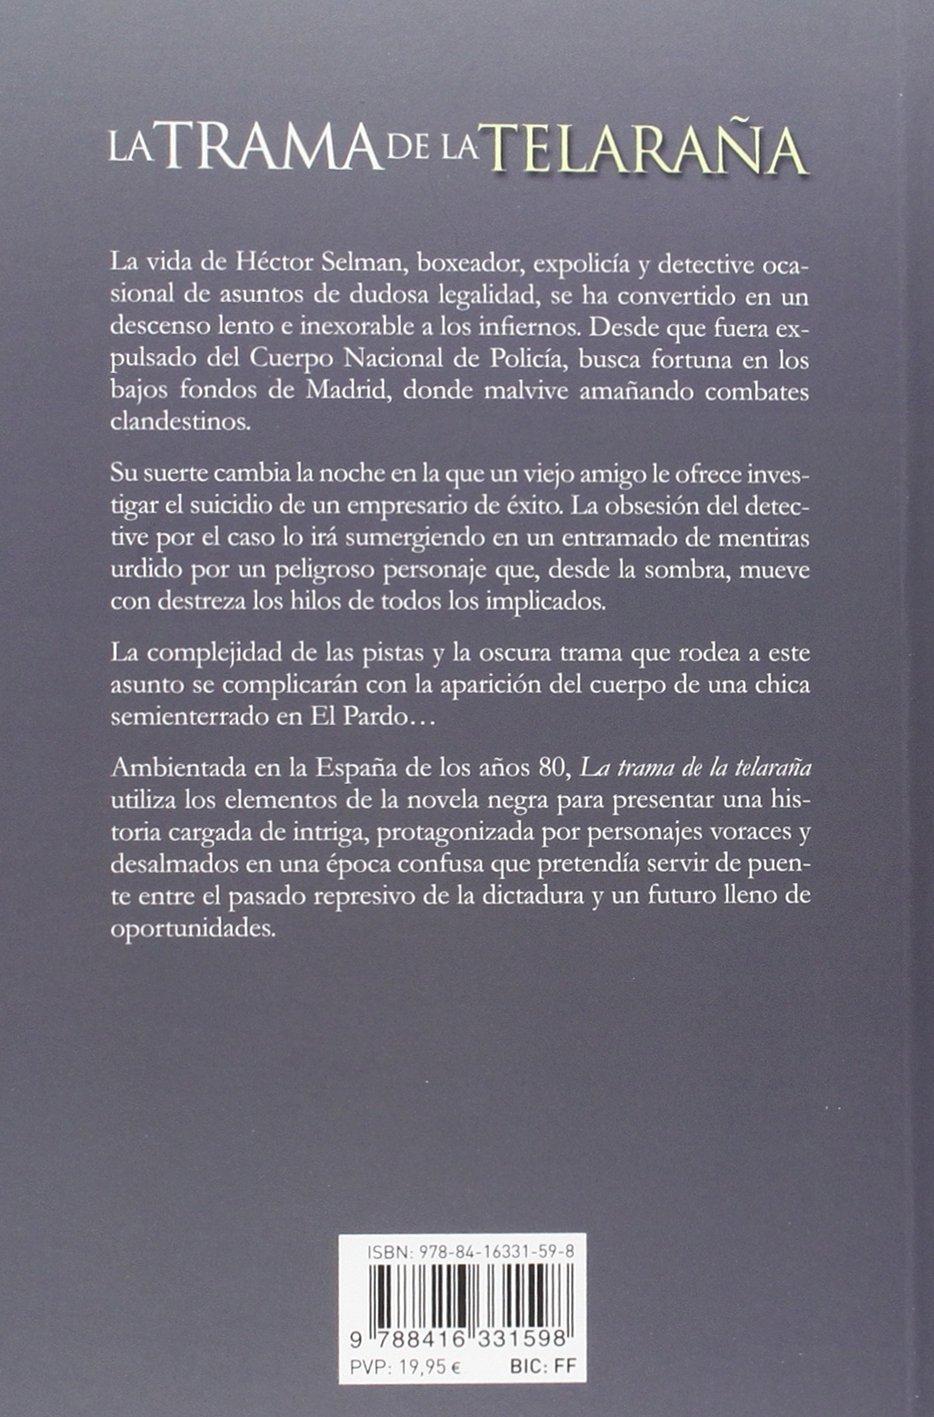 La trama de la telaraña (La huella): Amazon.es: J.D. Lisbona: Libros